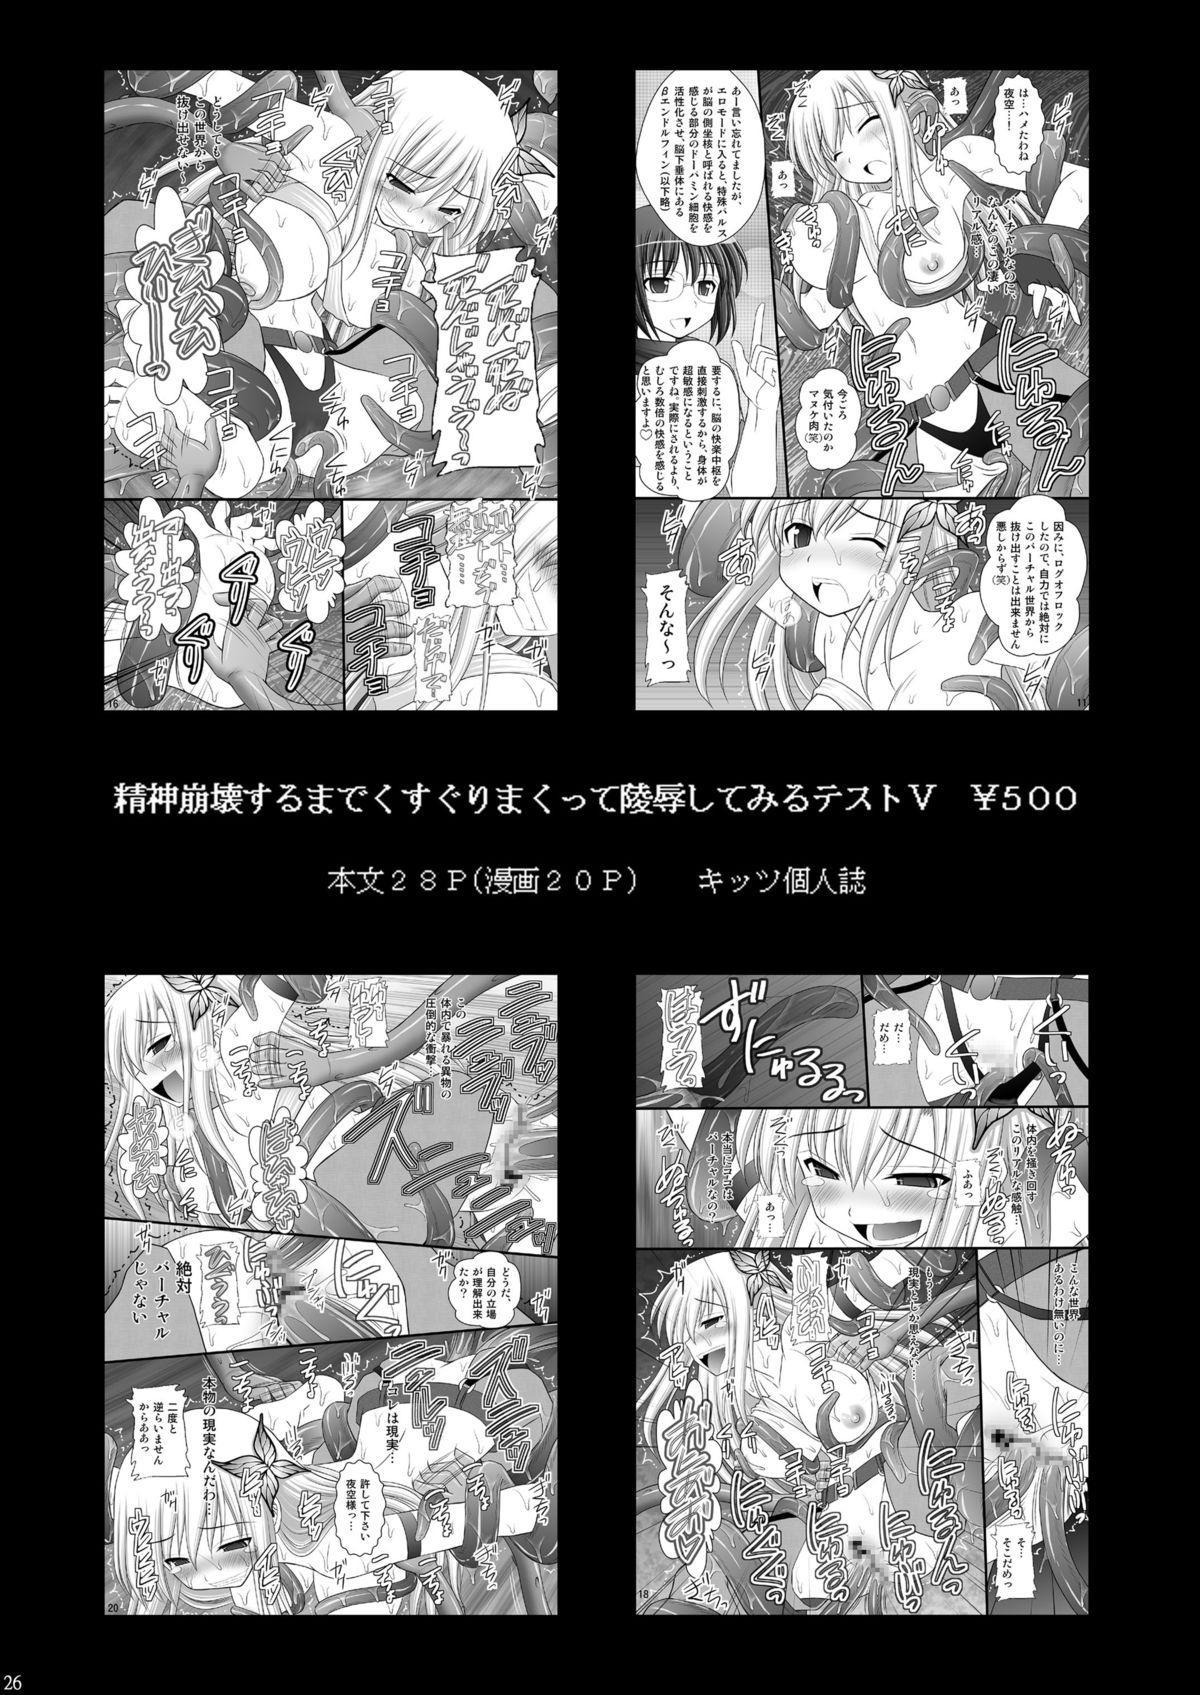 Toraware Hime I - System Master Nyaa Sakarae nee 24